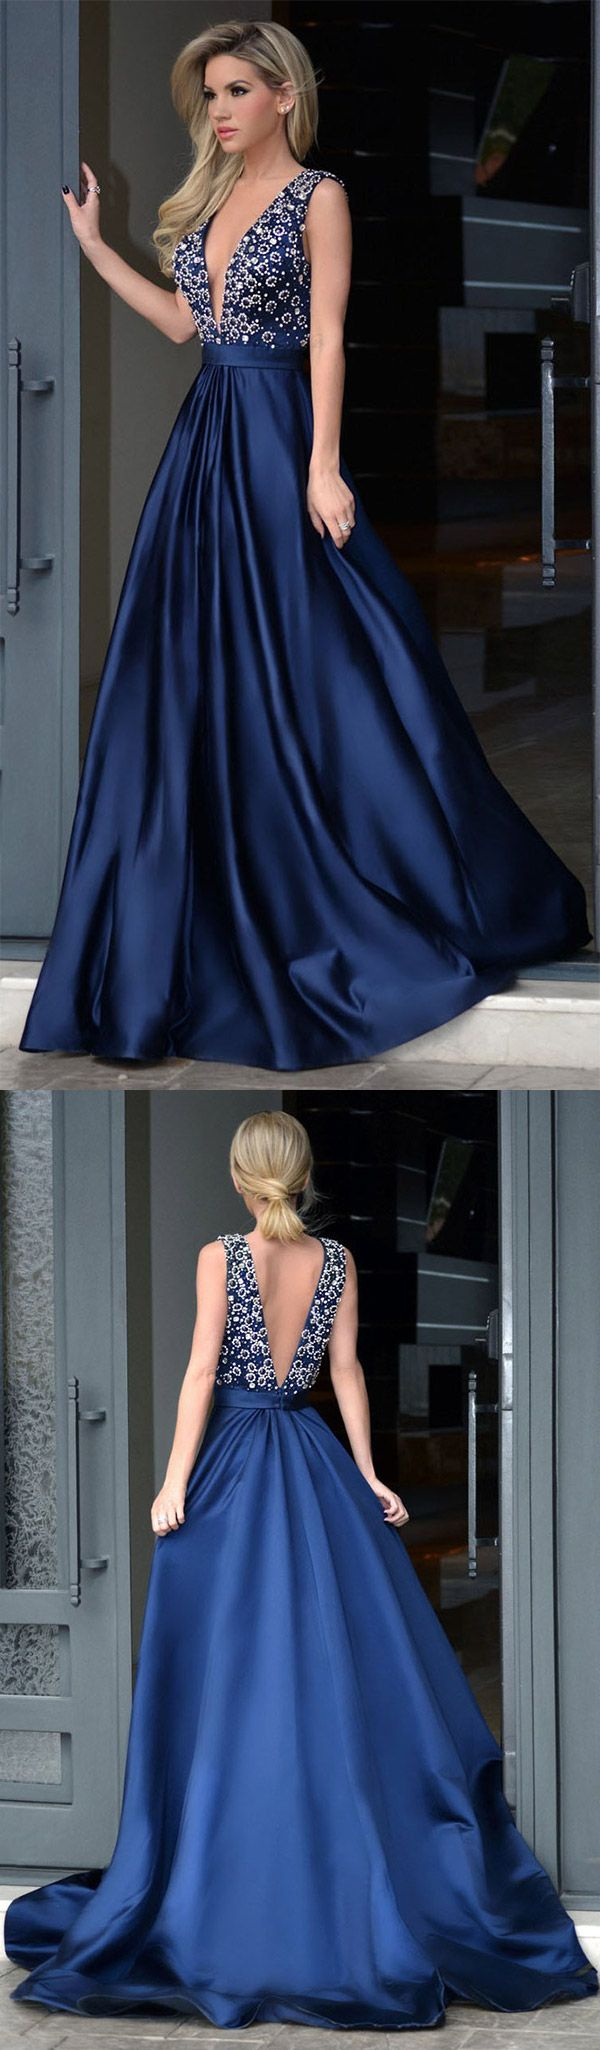 Long Formal Dresses A-line, Royal Blue Prom Dresses, 2018 Party Dresses Backless, Satin Evening Dresses Beading Modest